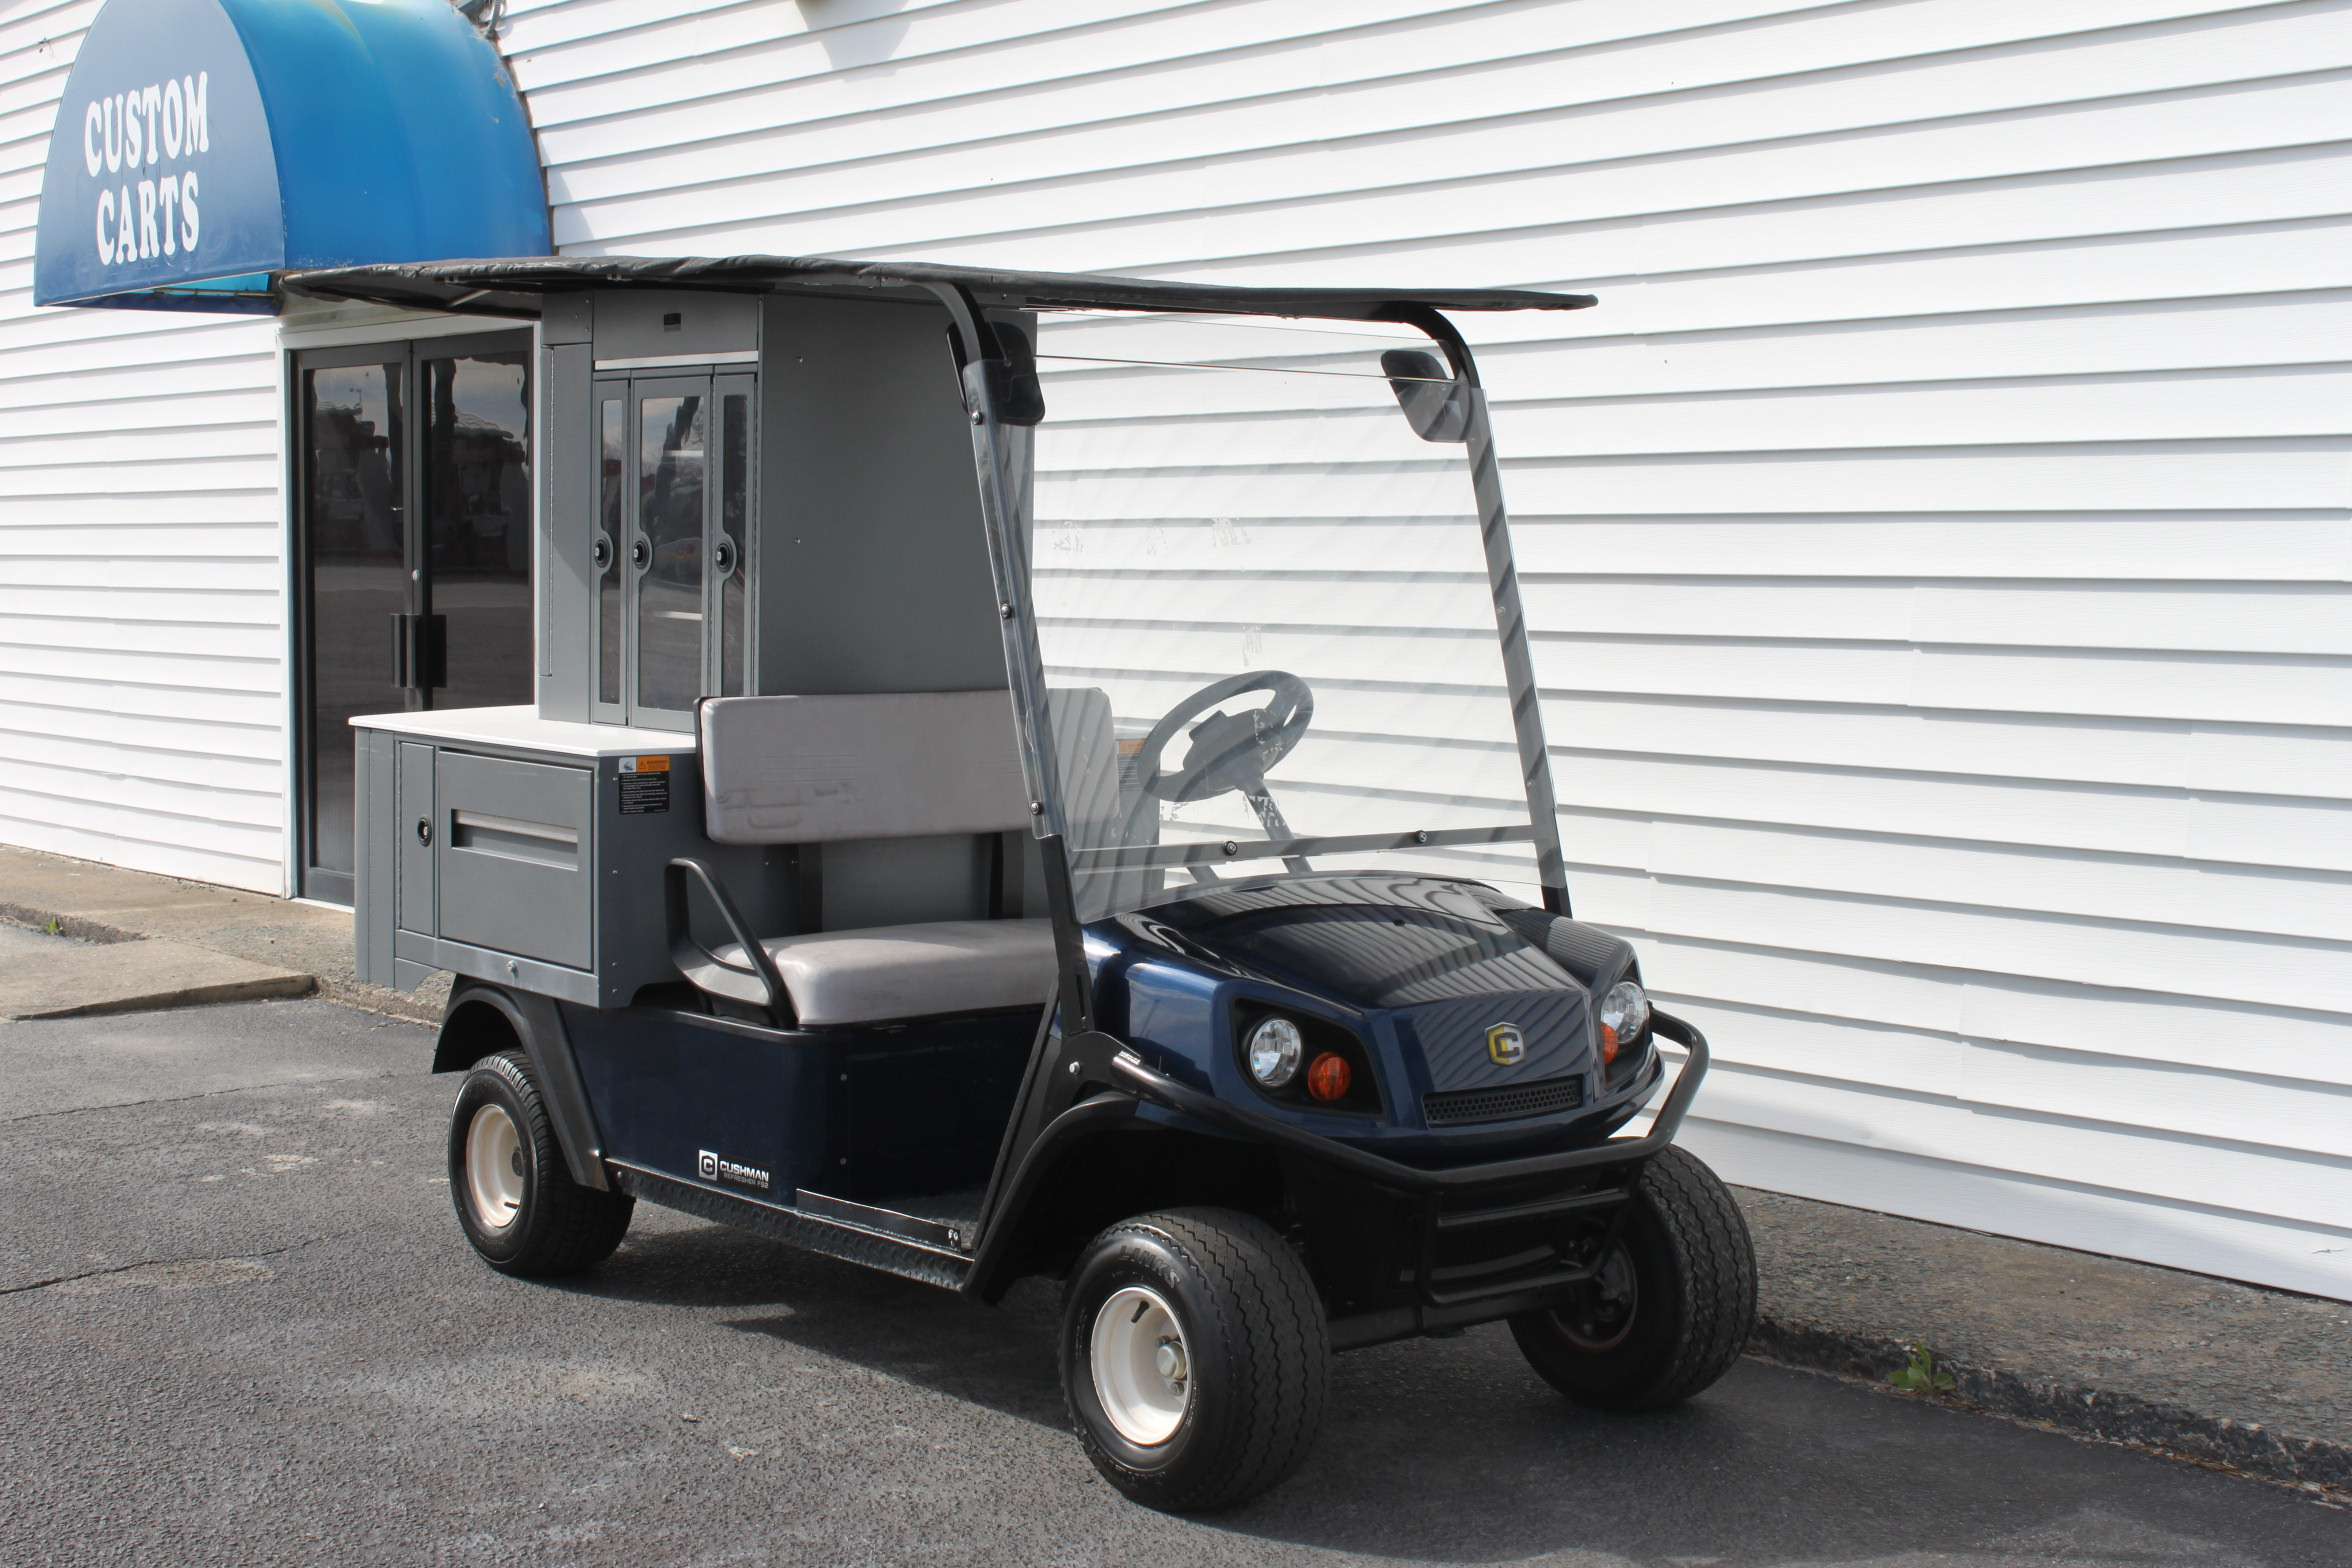 Yamaha Golf Cart Wiring Diagram Brakelights Will Be Electric G27e Fisher Pontoon Boat Serial G29 36v